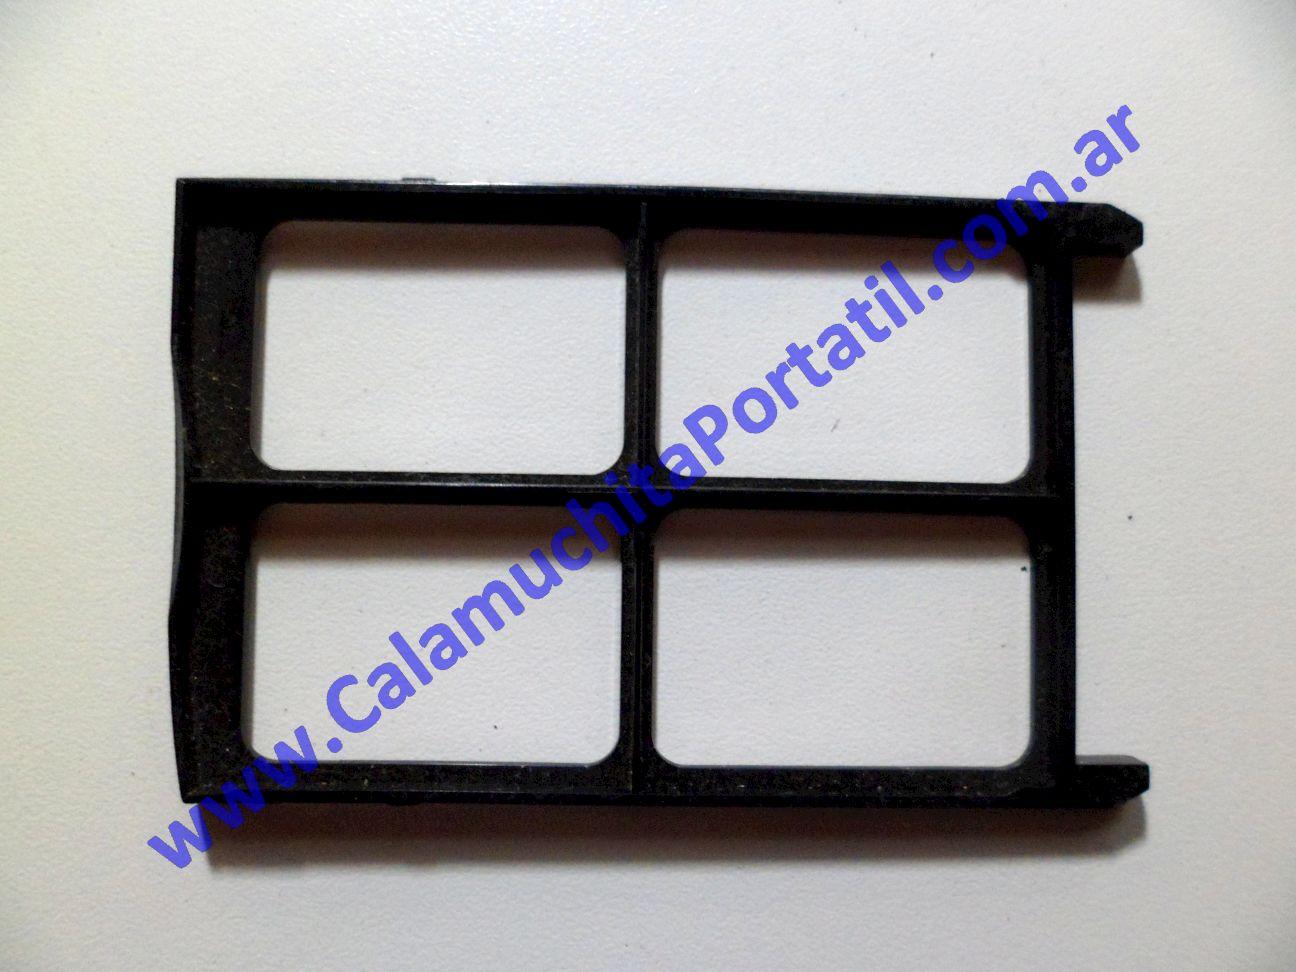 0023XPP Protector PCMCIA Toshiba Satellite A60-SP159